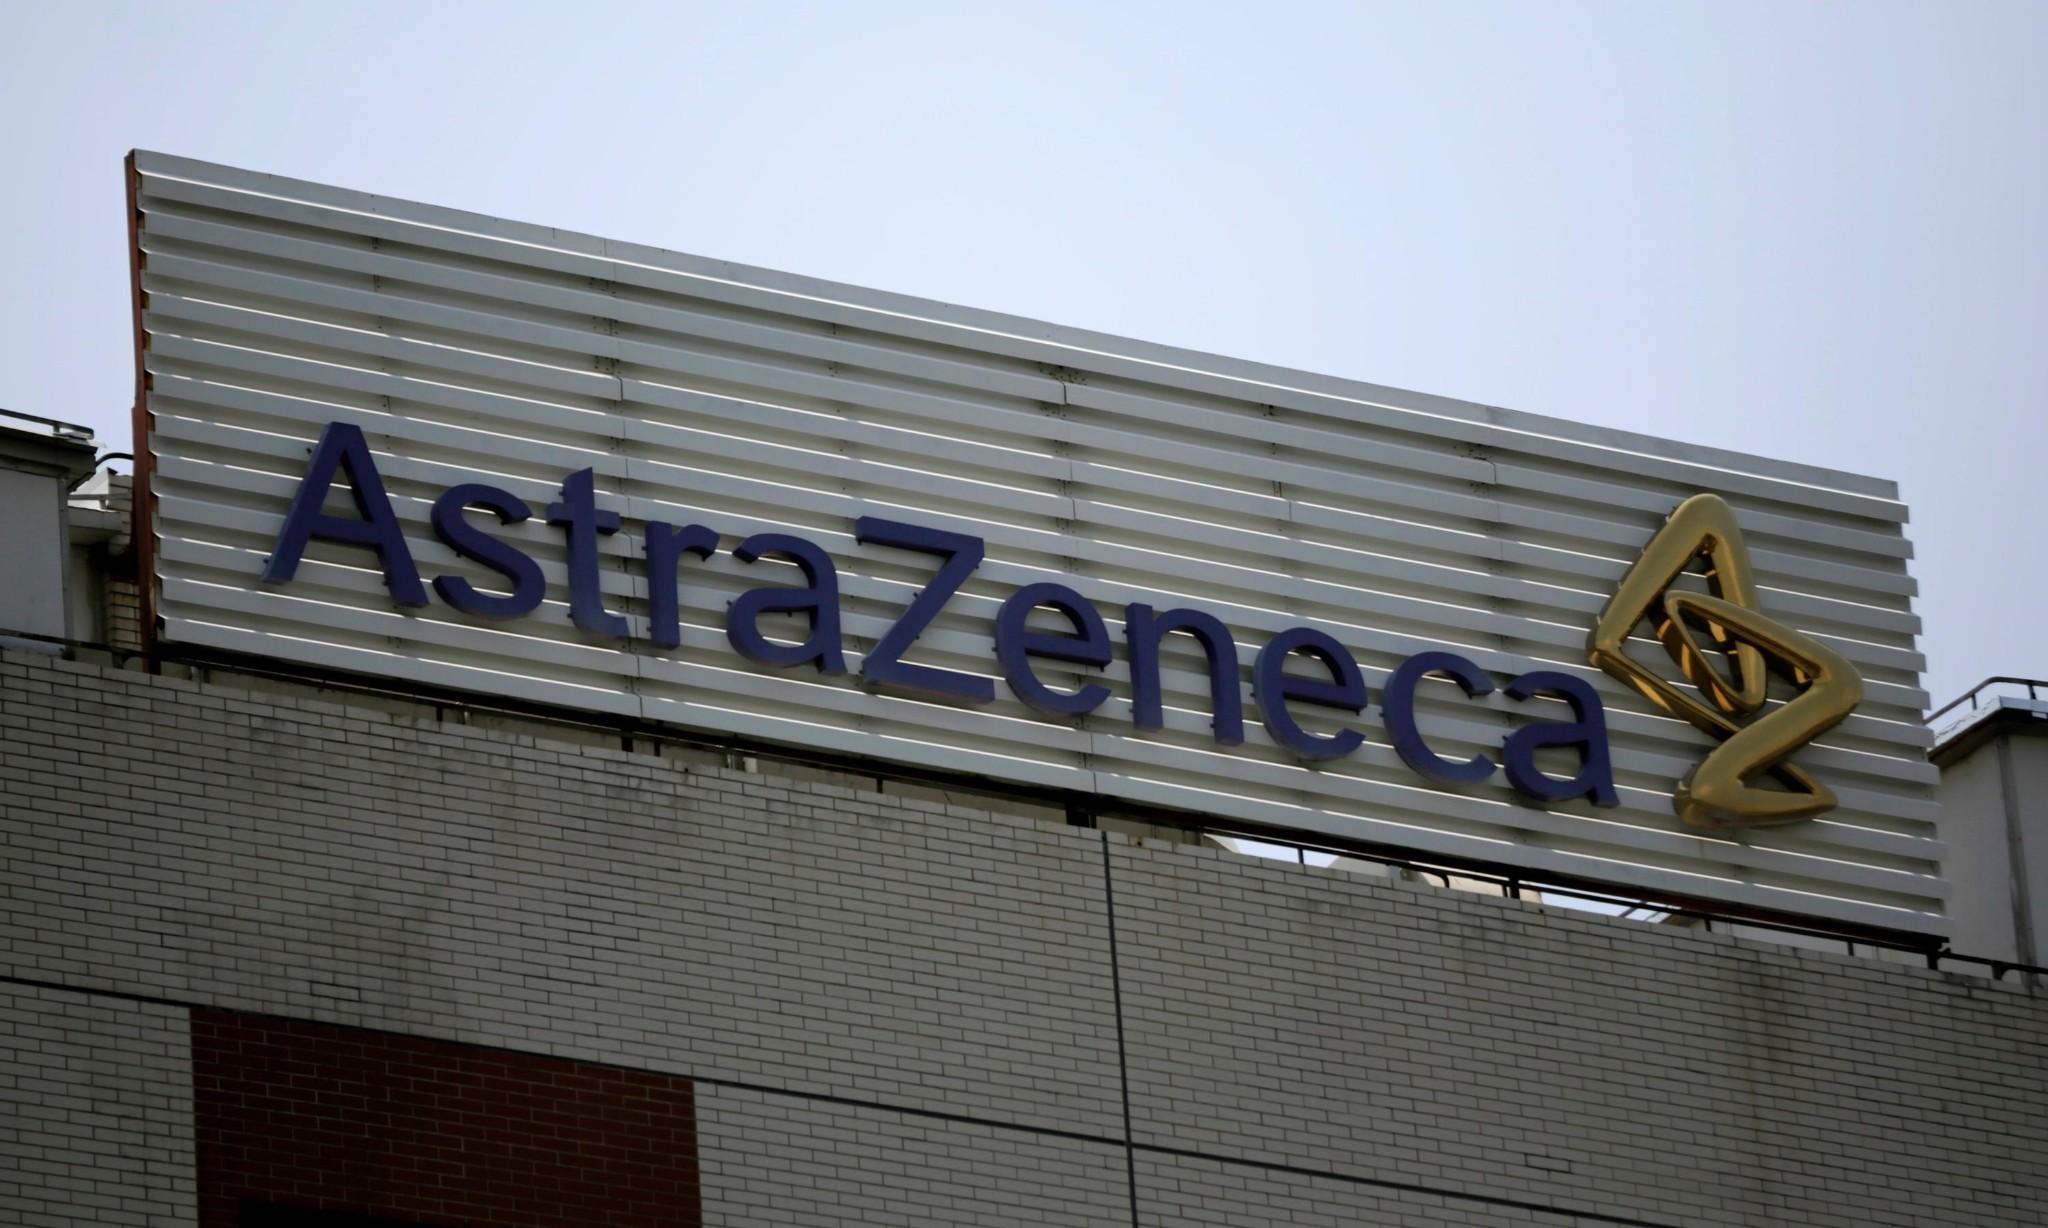 AstraZeneca to move some UK jobs to Poland, Costa Rica and Malaysia